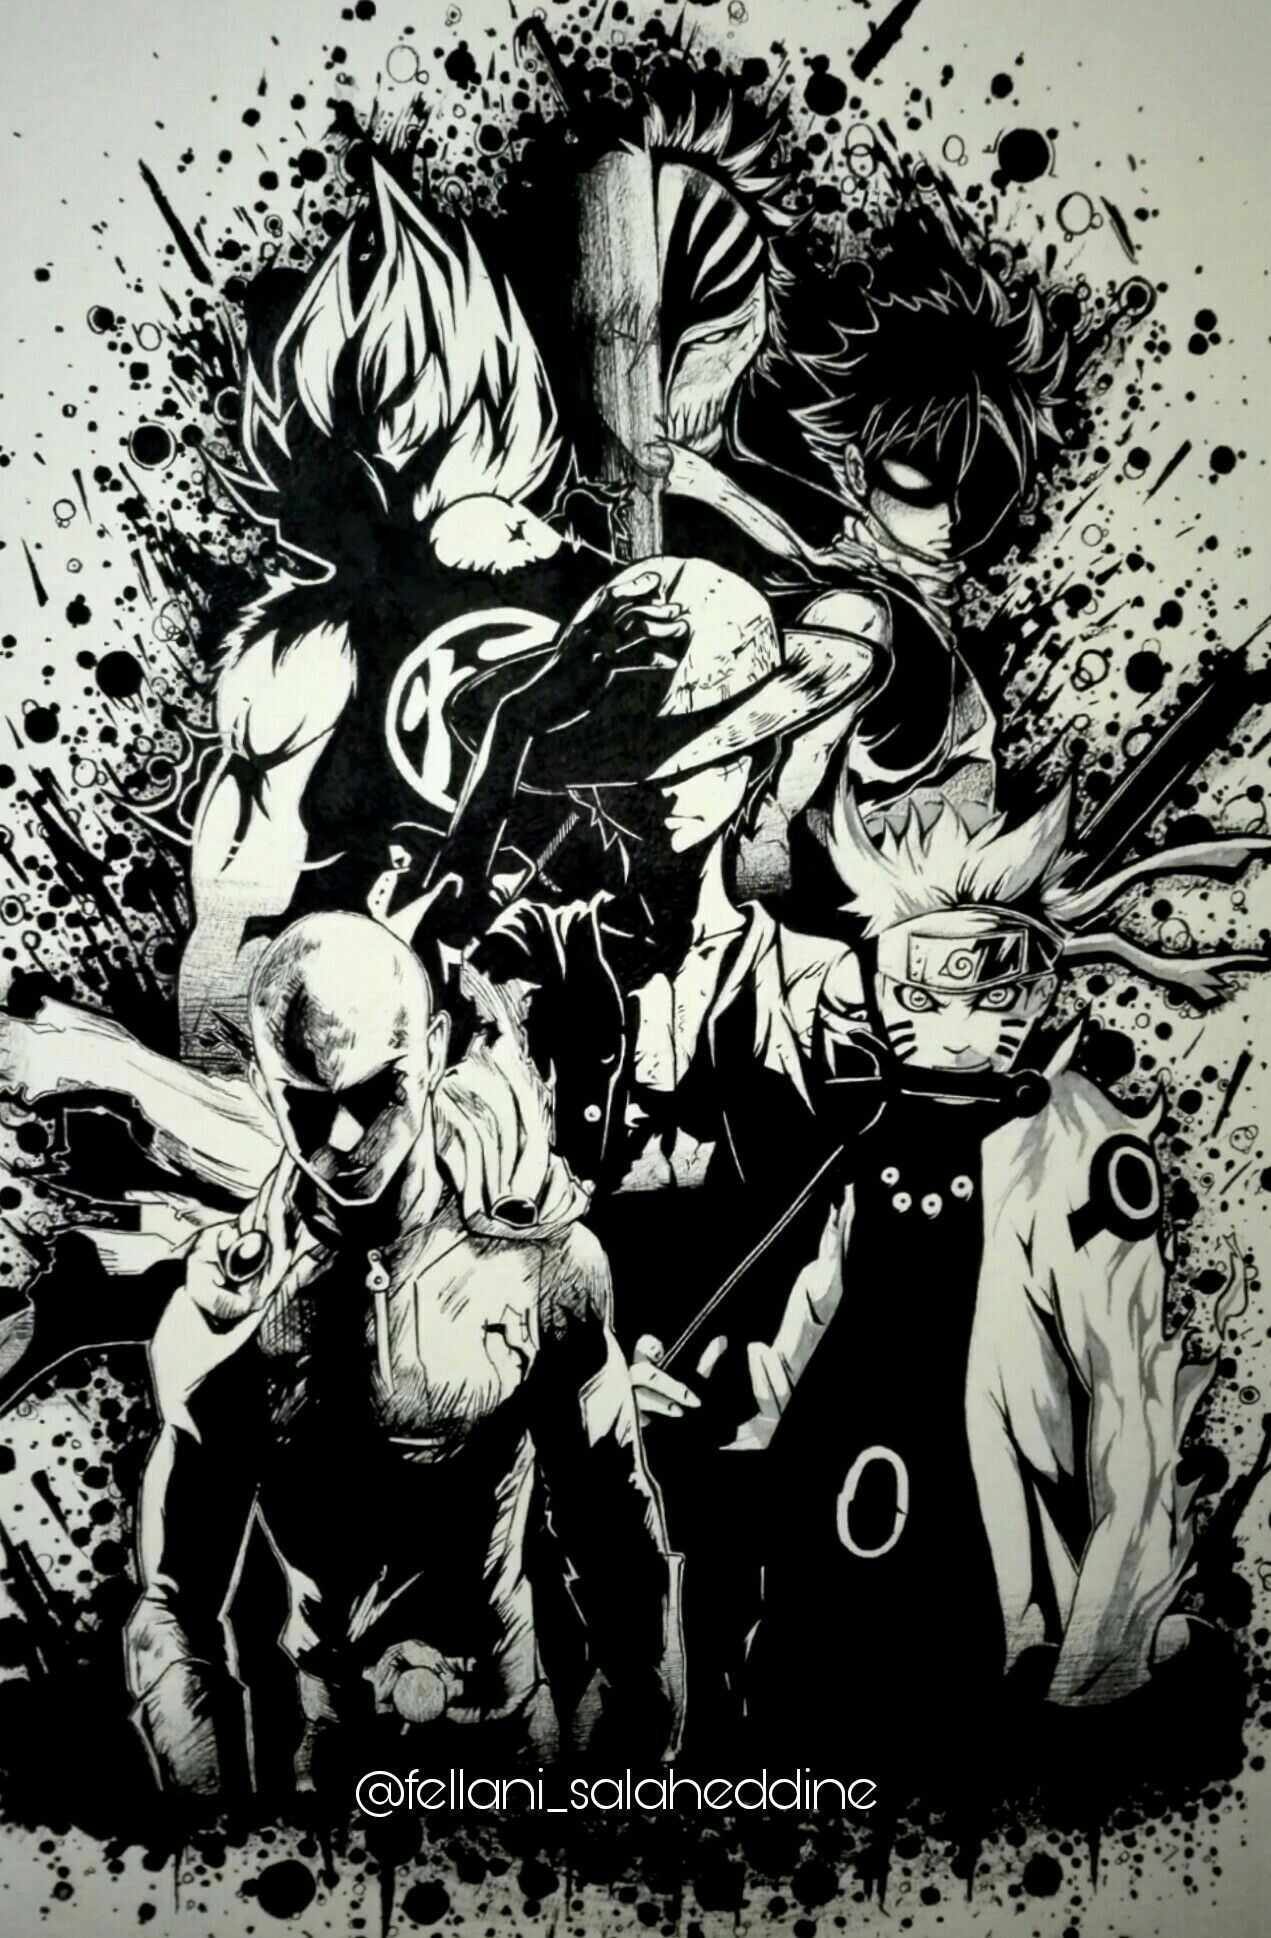 Legendary Anime Heroes Goku Ichigo Natsu Luffy Saitama And Naruto Drawing Tatuagens De Anime Anime Tatoo Desenhos De Anime